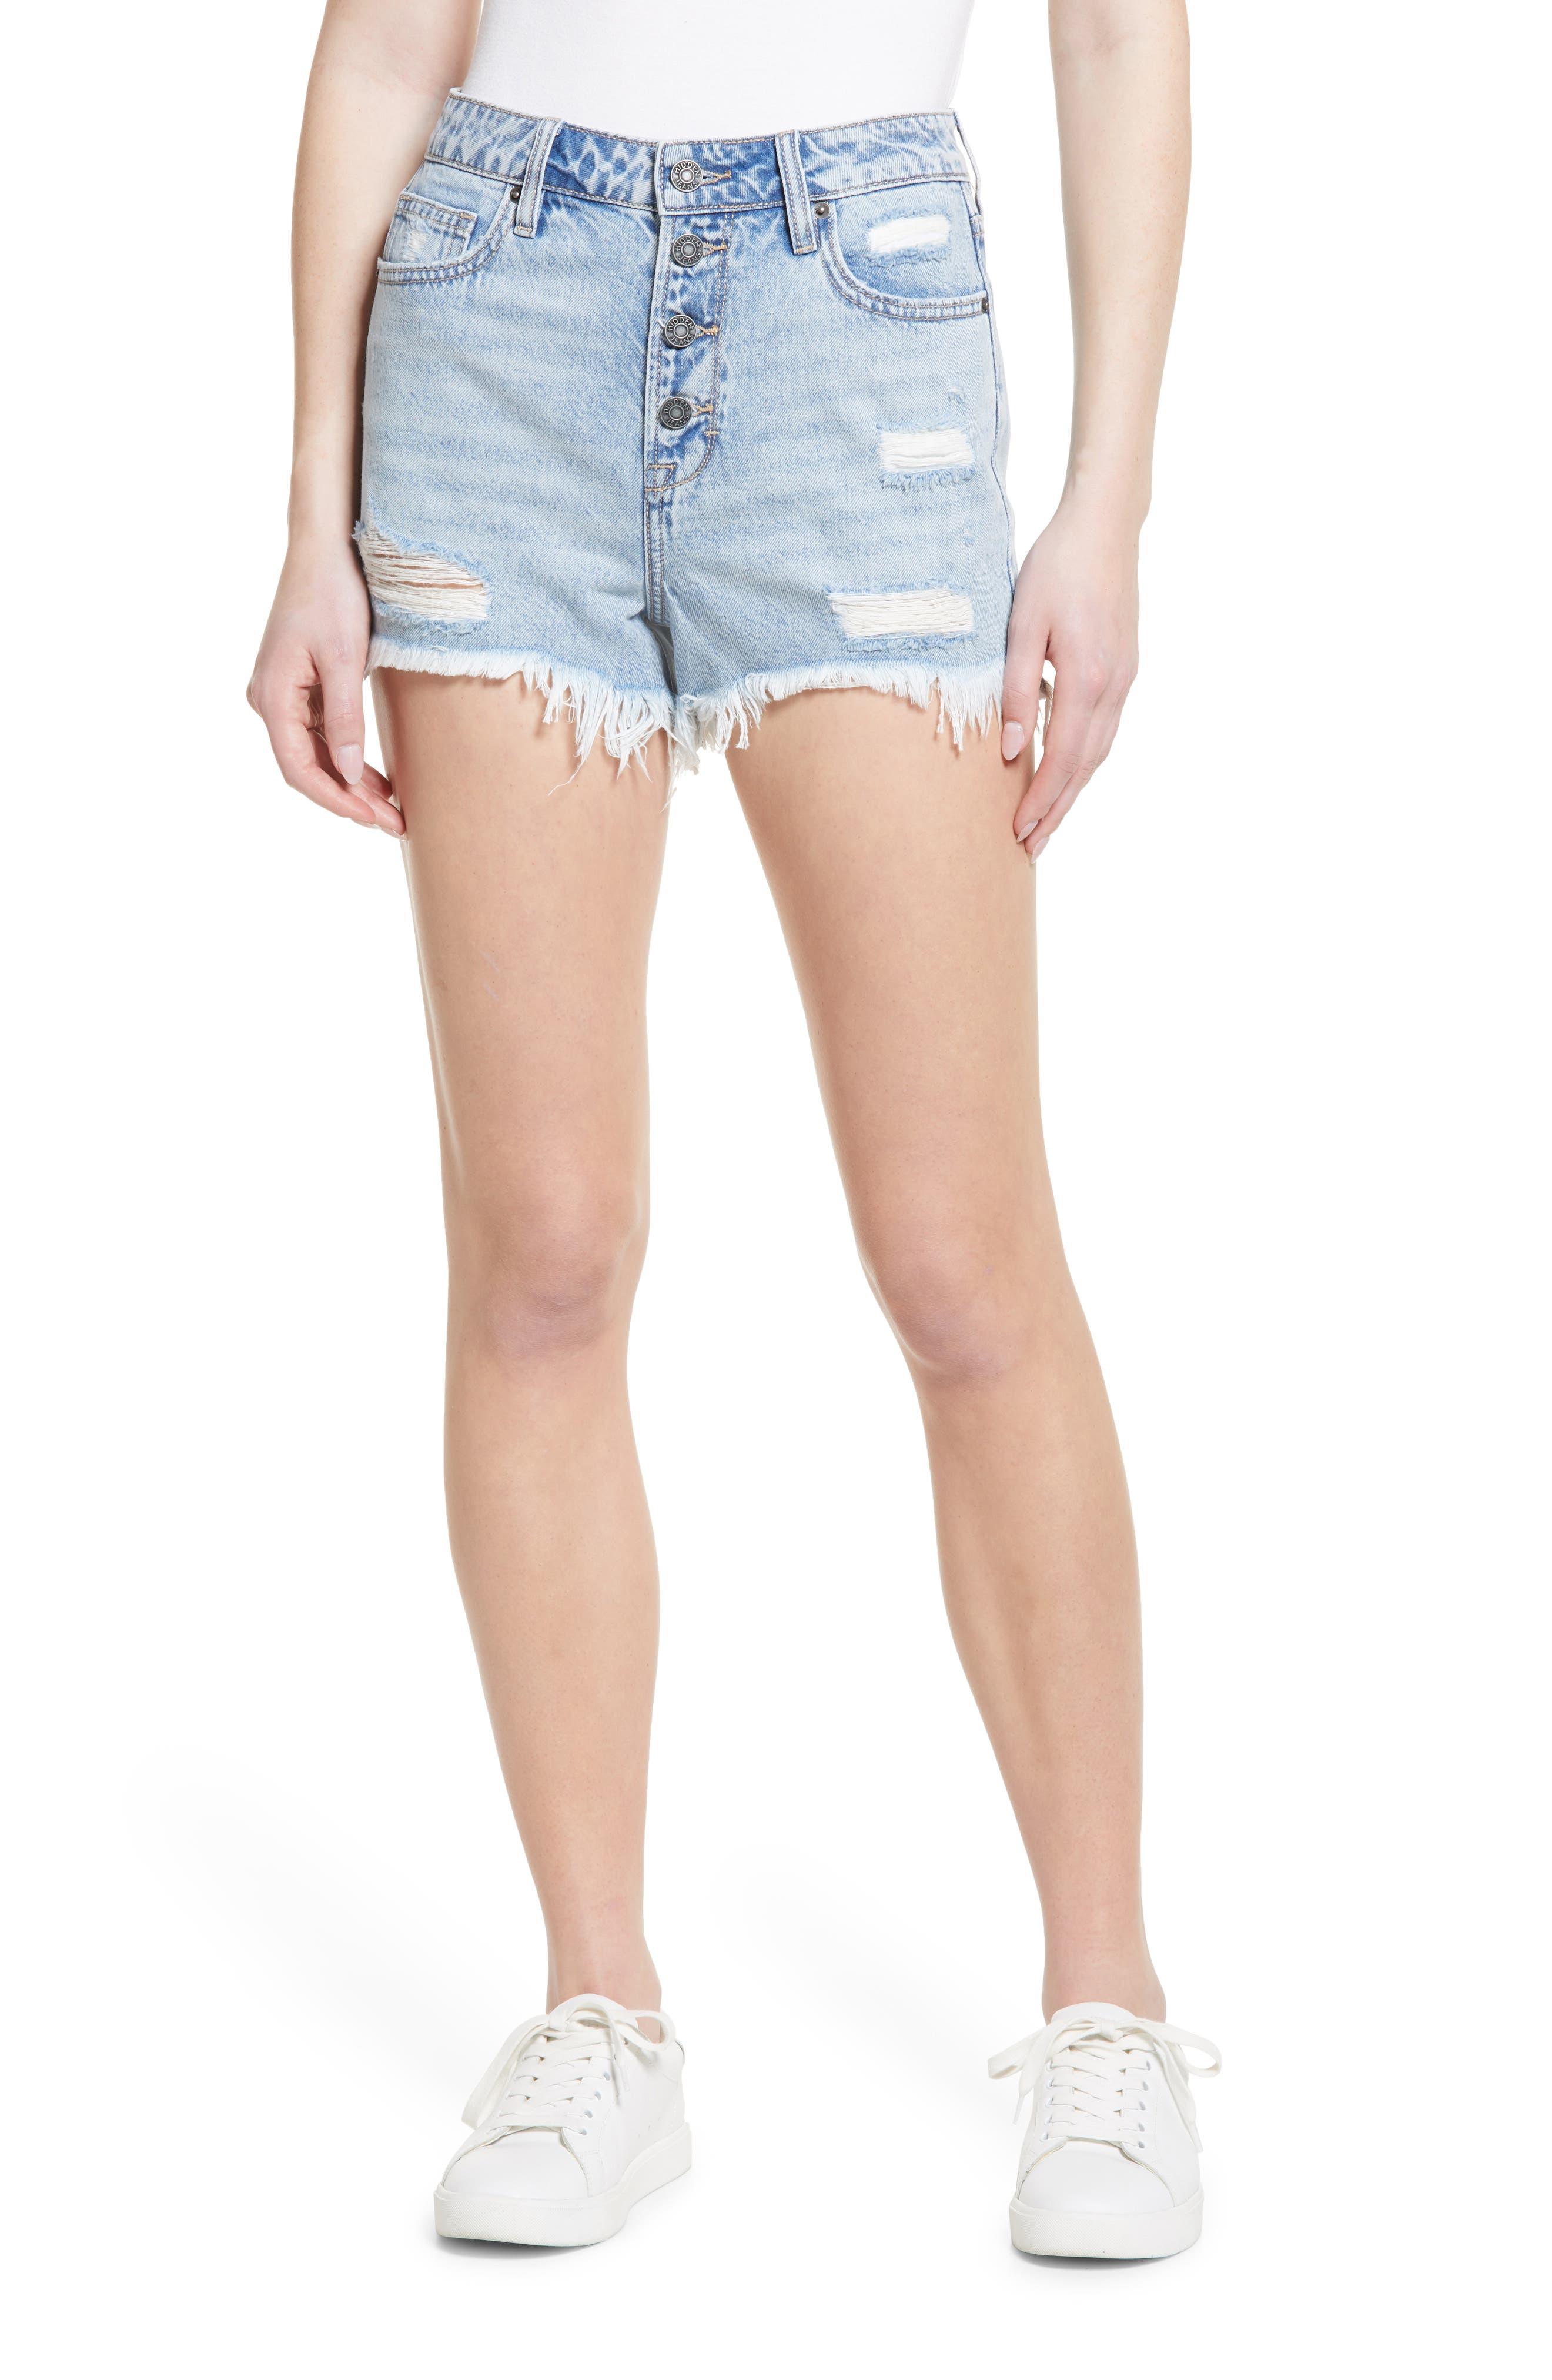 Distressed High Waist Nonstretch Cutoff Denim Mom Shorts